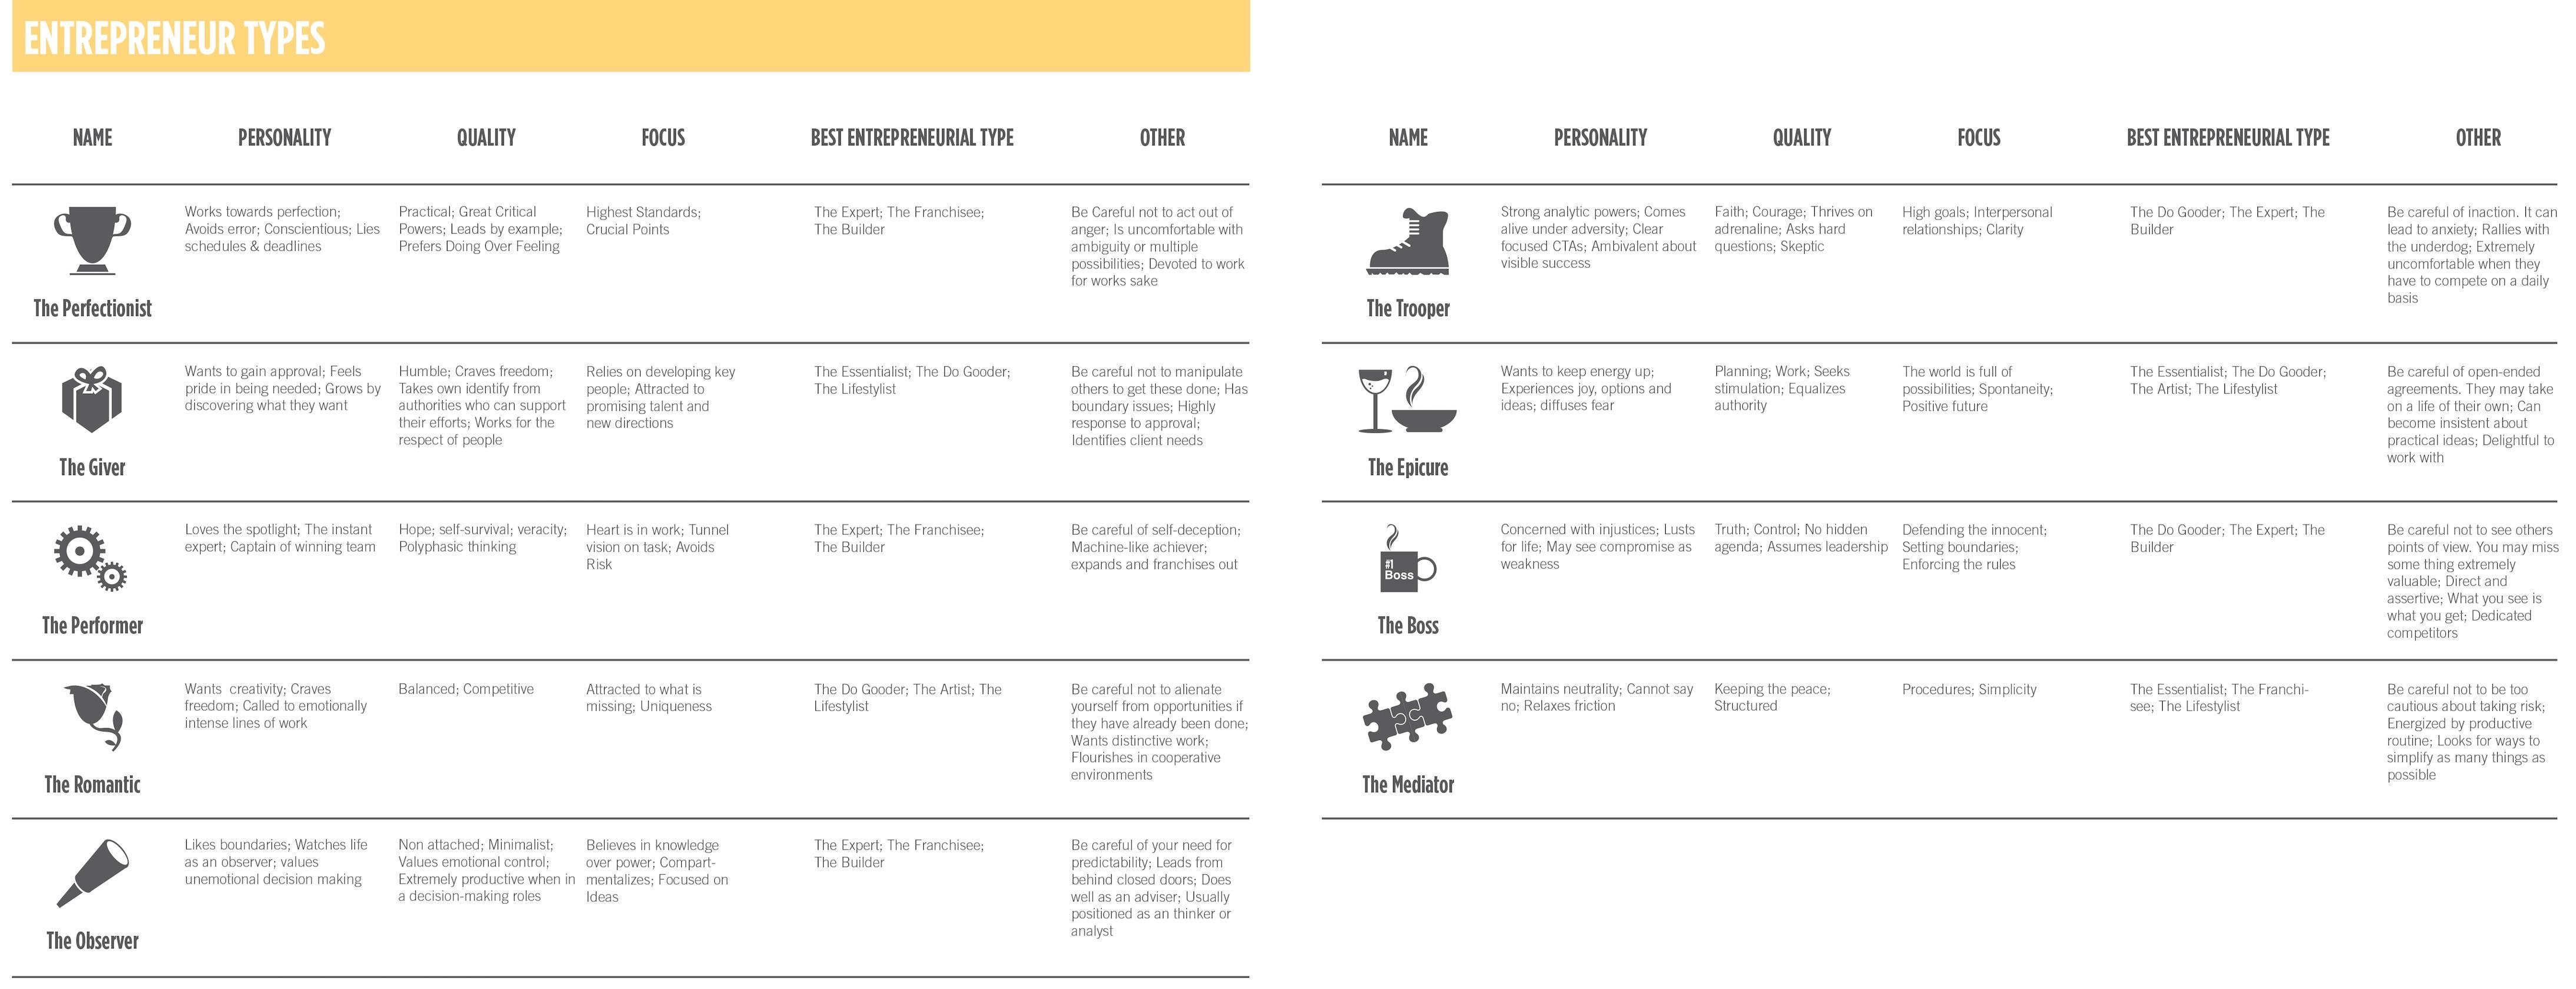 Figure 5.3-Entrepreneur Types